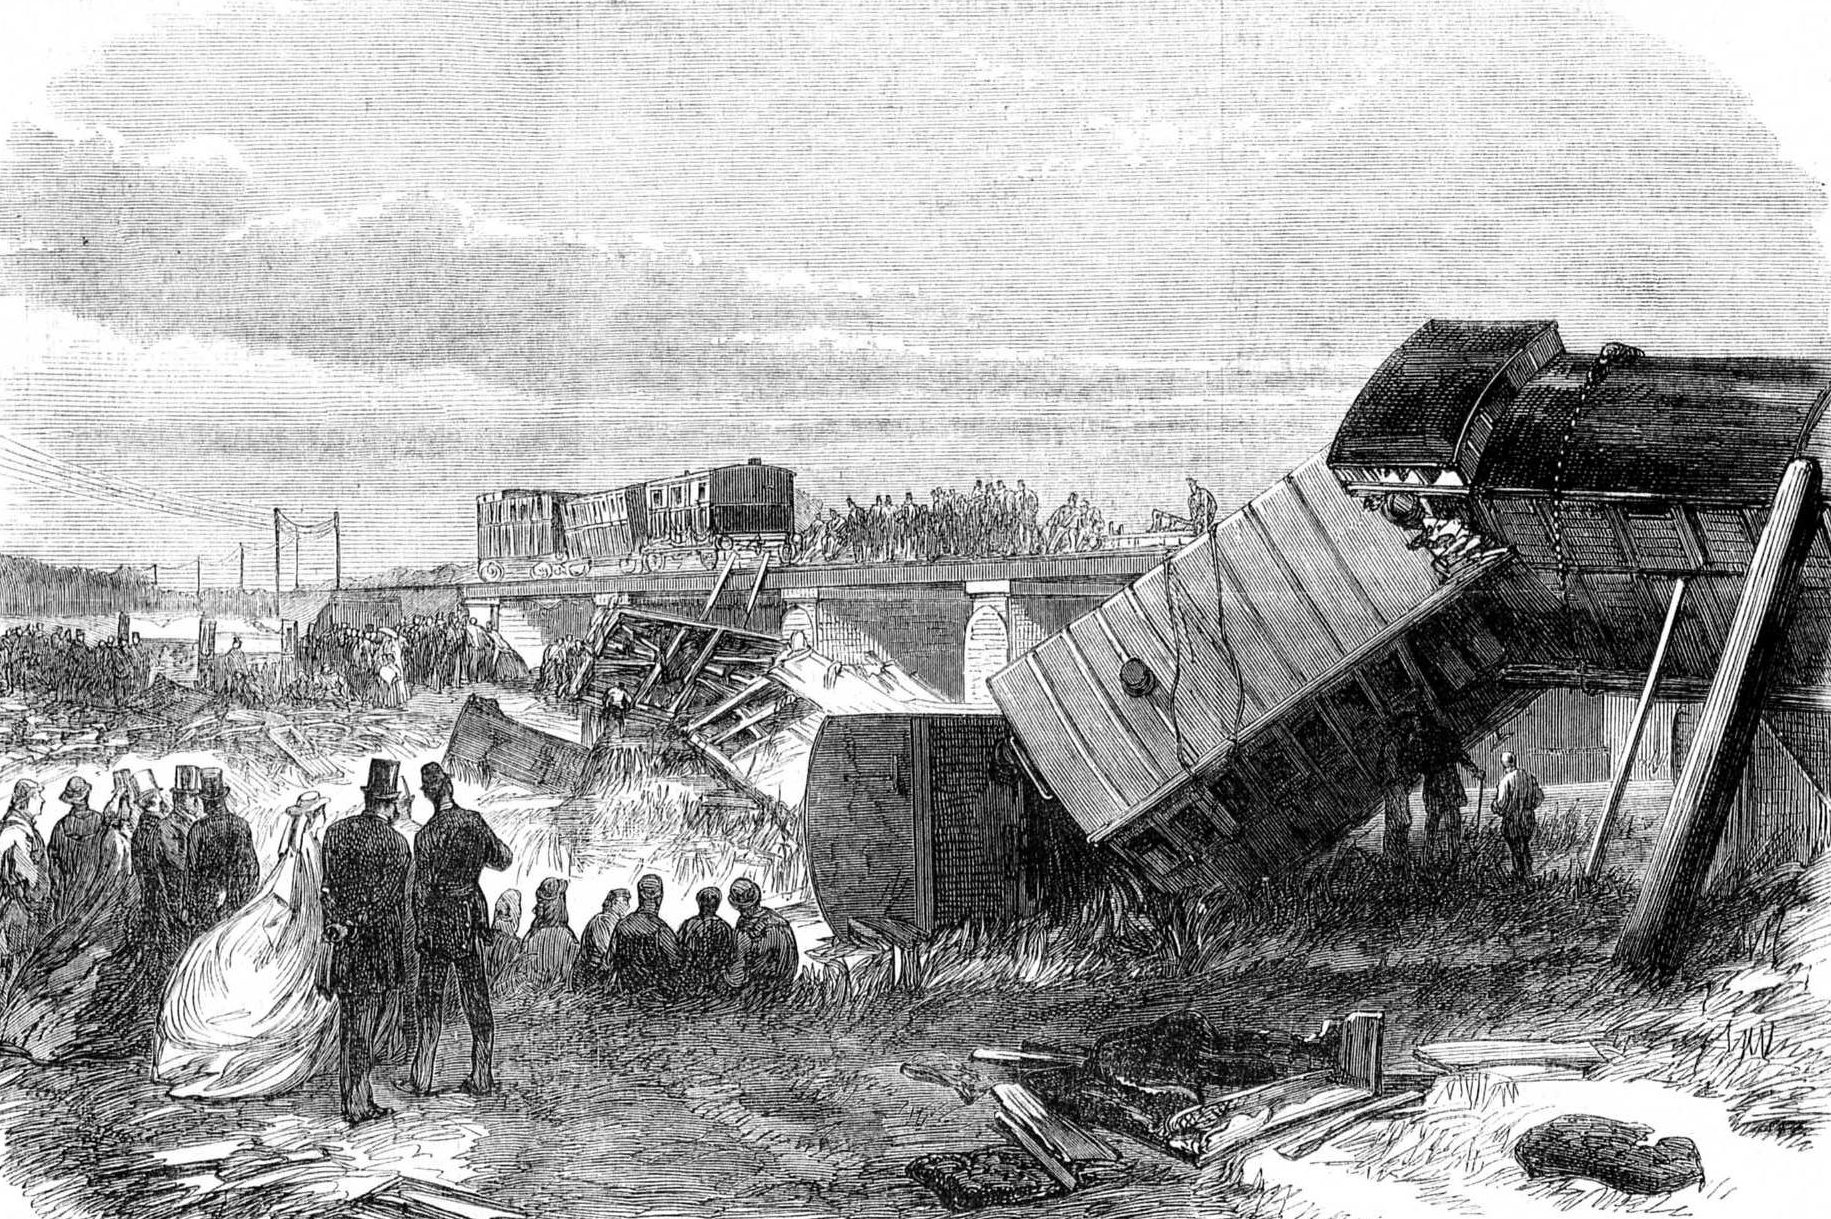 The Staplehurst Railway crash, witnessed by Charles Dickens